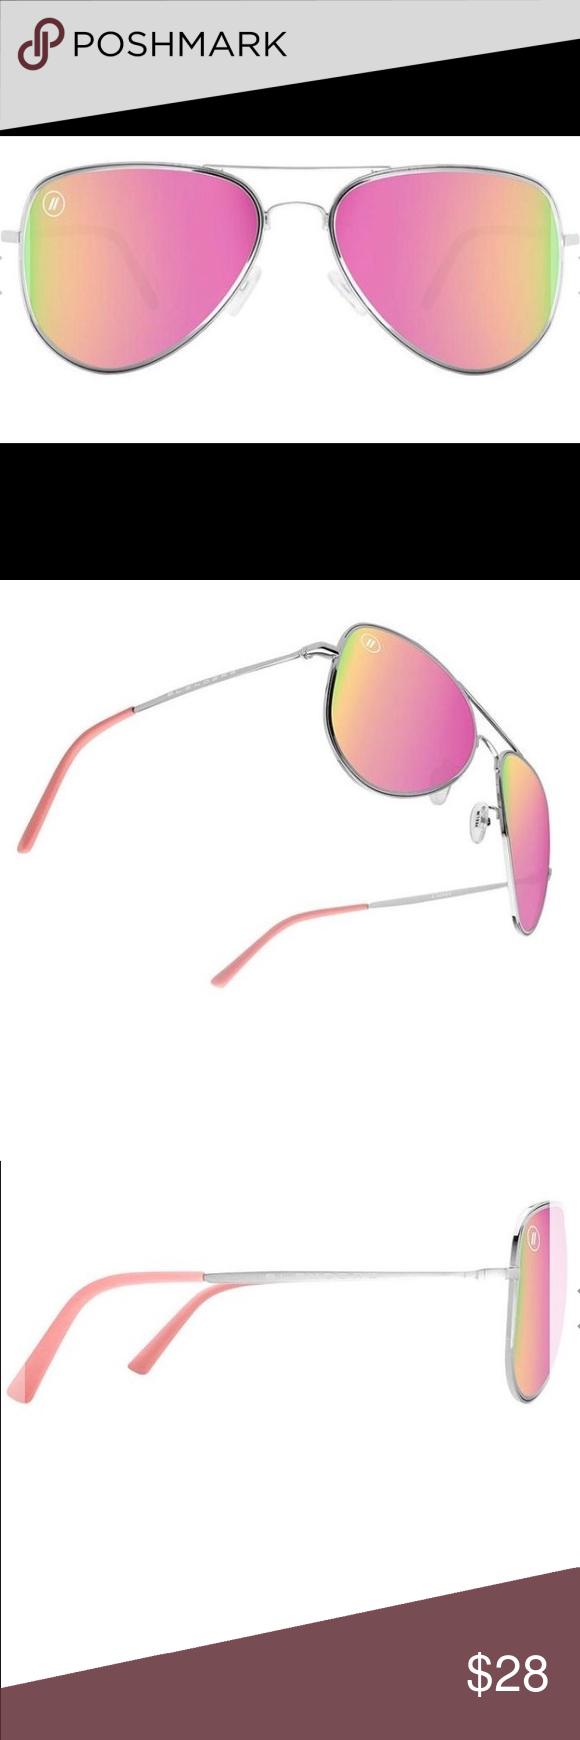 63a5732f3ff Blenders high class jes Blenders eyewear aviators style